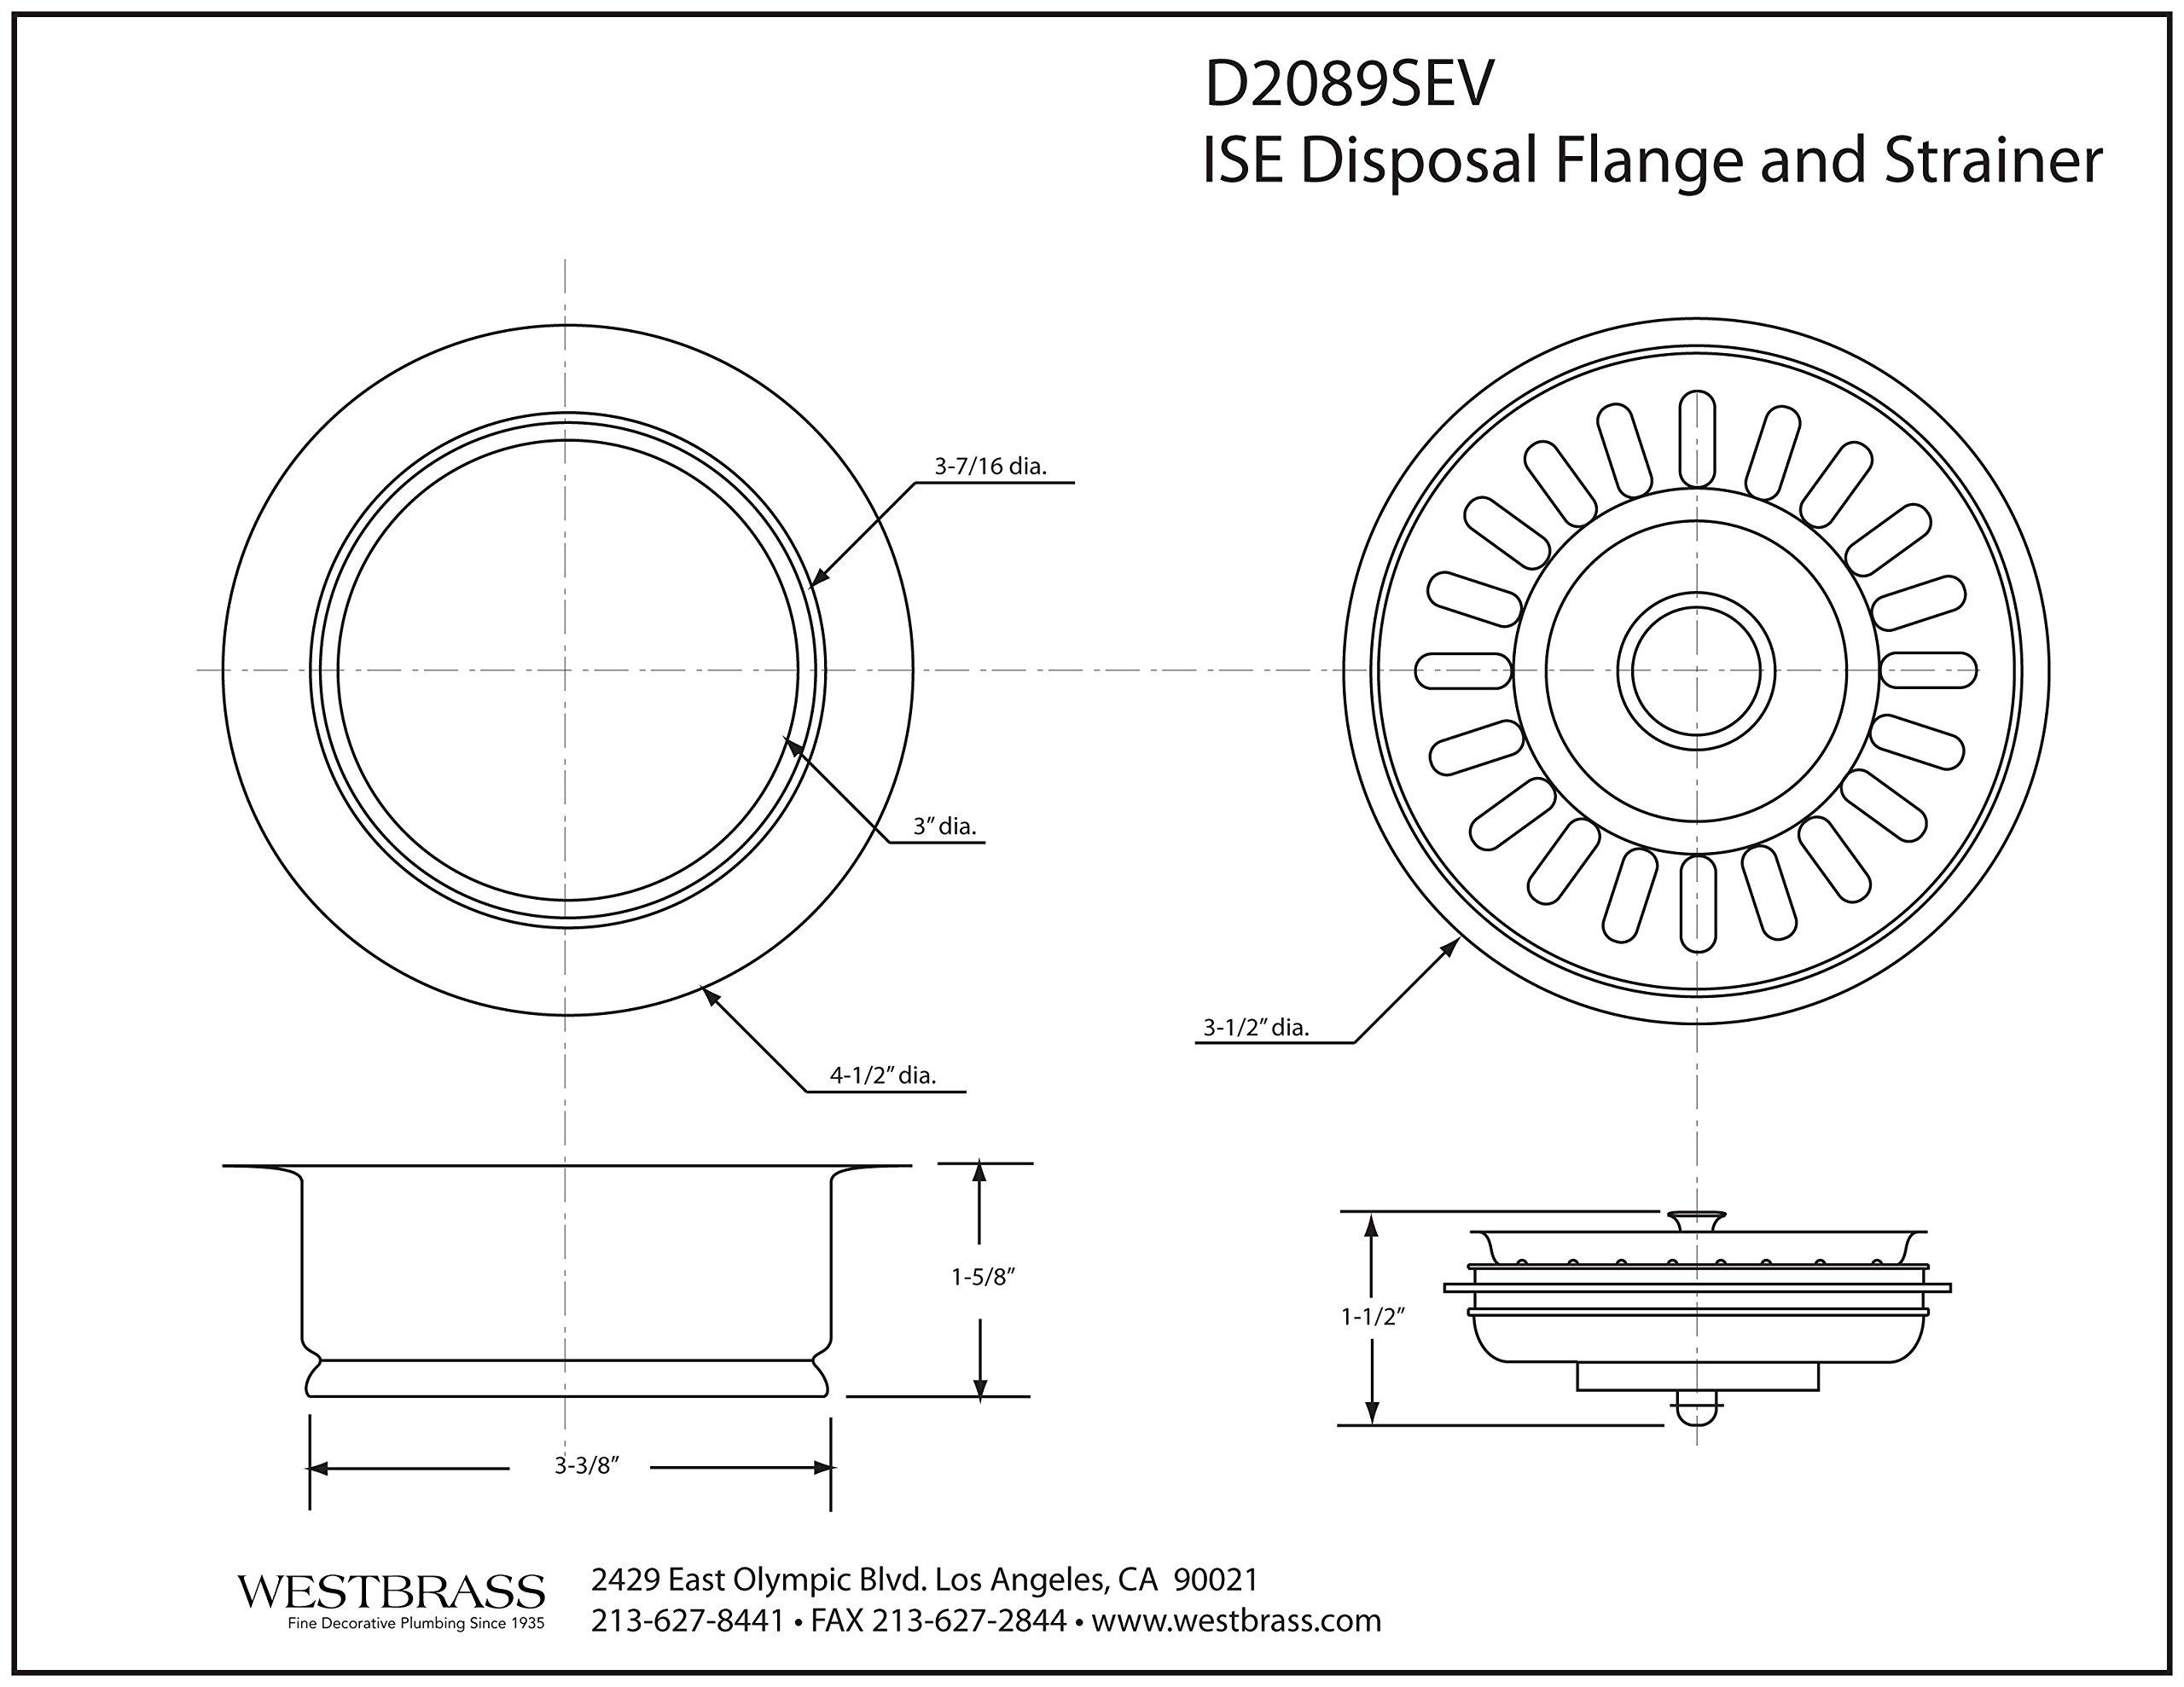 Westbrass InSinkErator Style Disposal Flange & Strainer Basket, Oil Rubbed Bronze, D2089SEV-12 by Westbrass (Image #2)